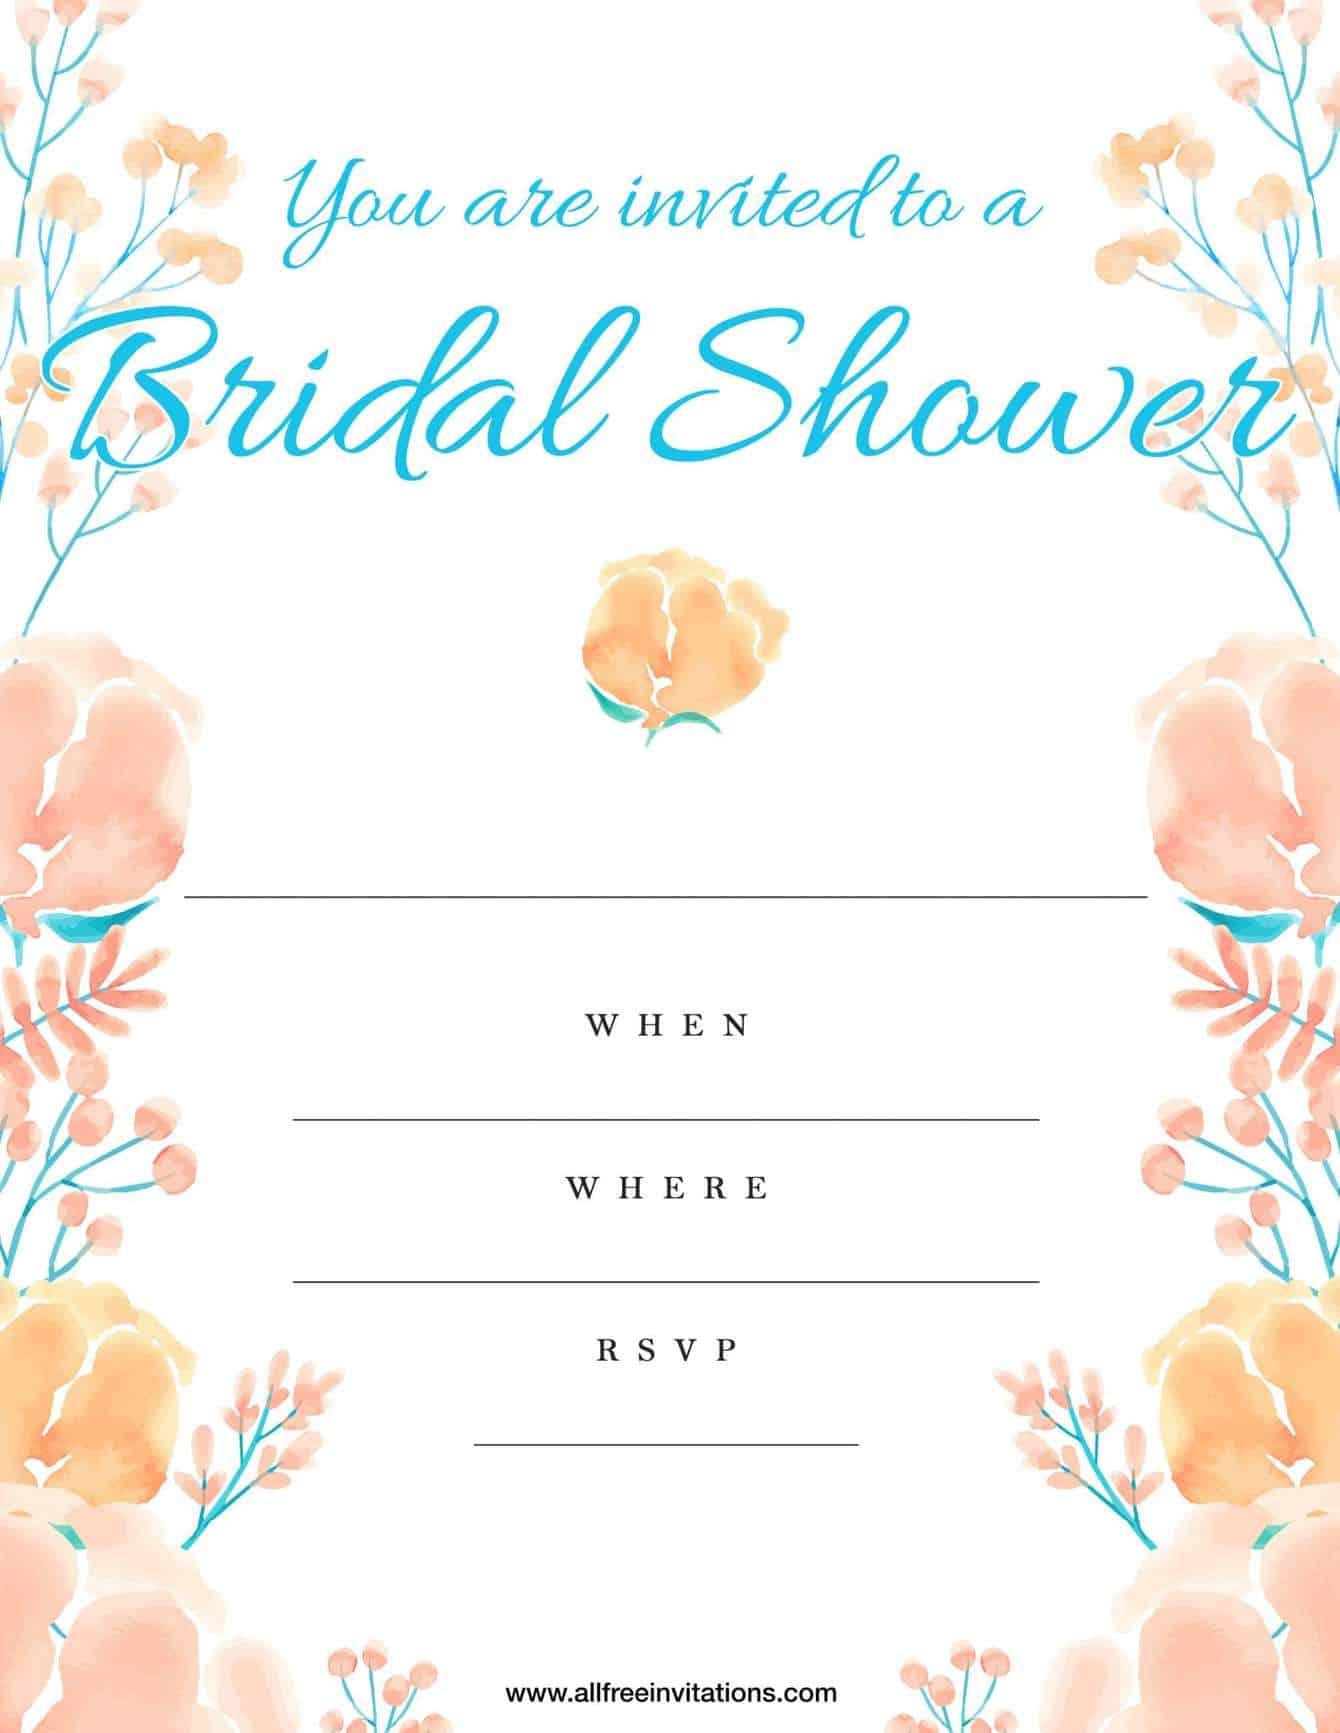 Bridal shower invitation peach and white floral design